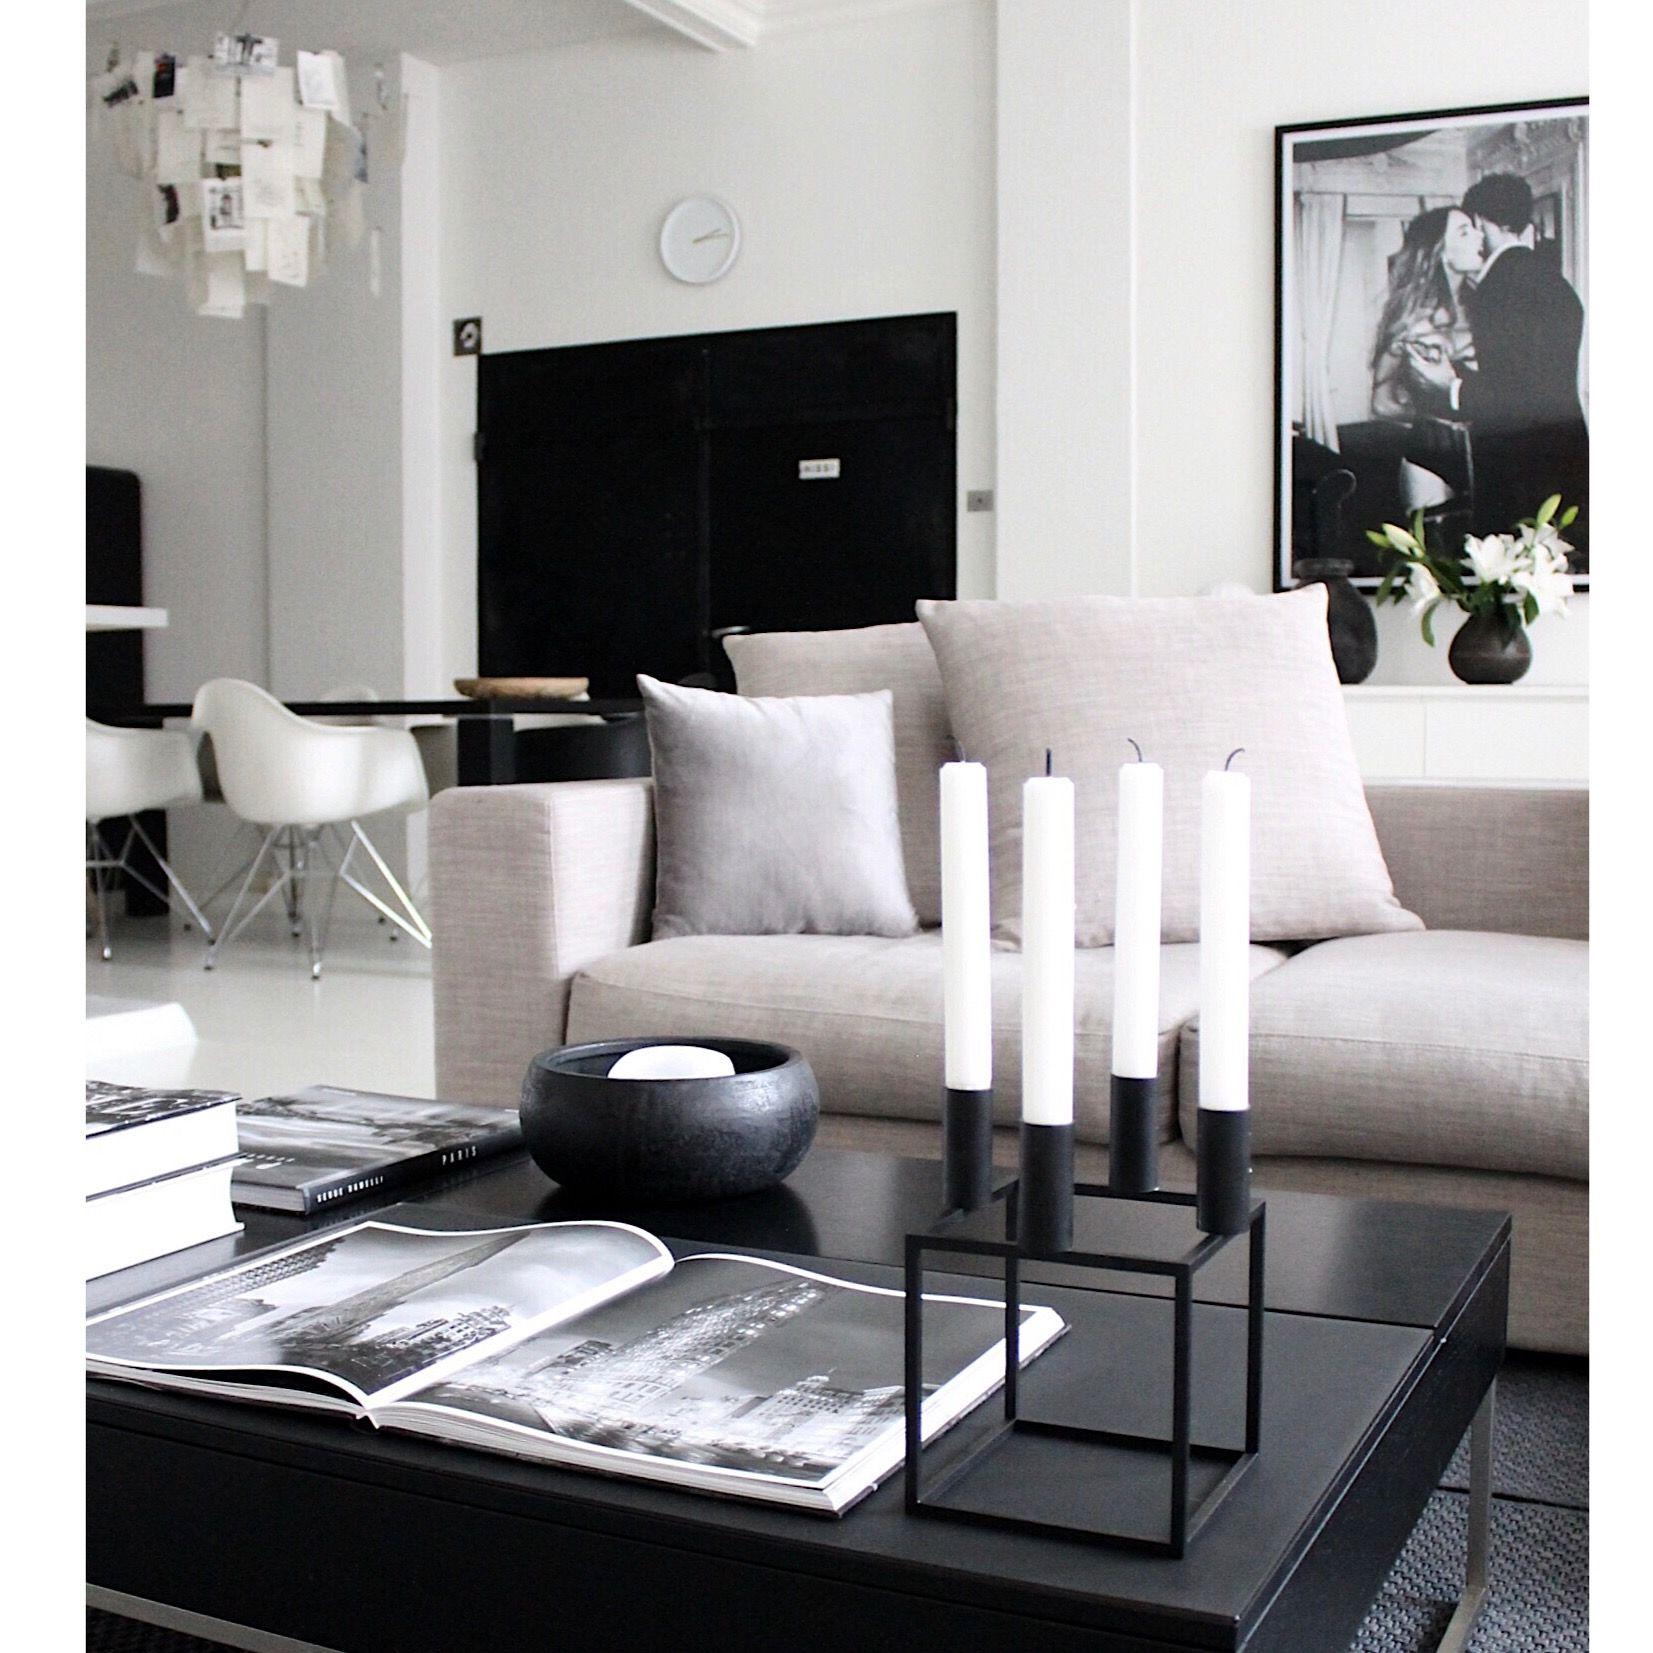 Scandinavian interior, modern, stylish, lux